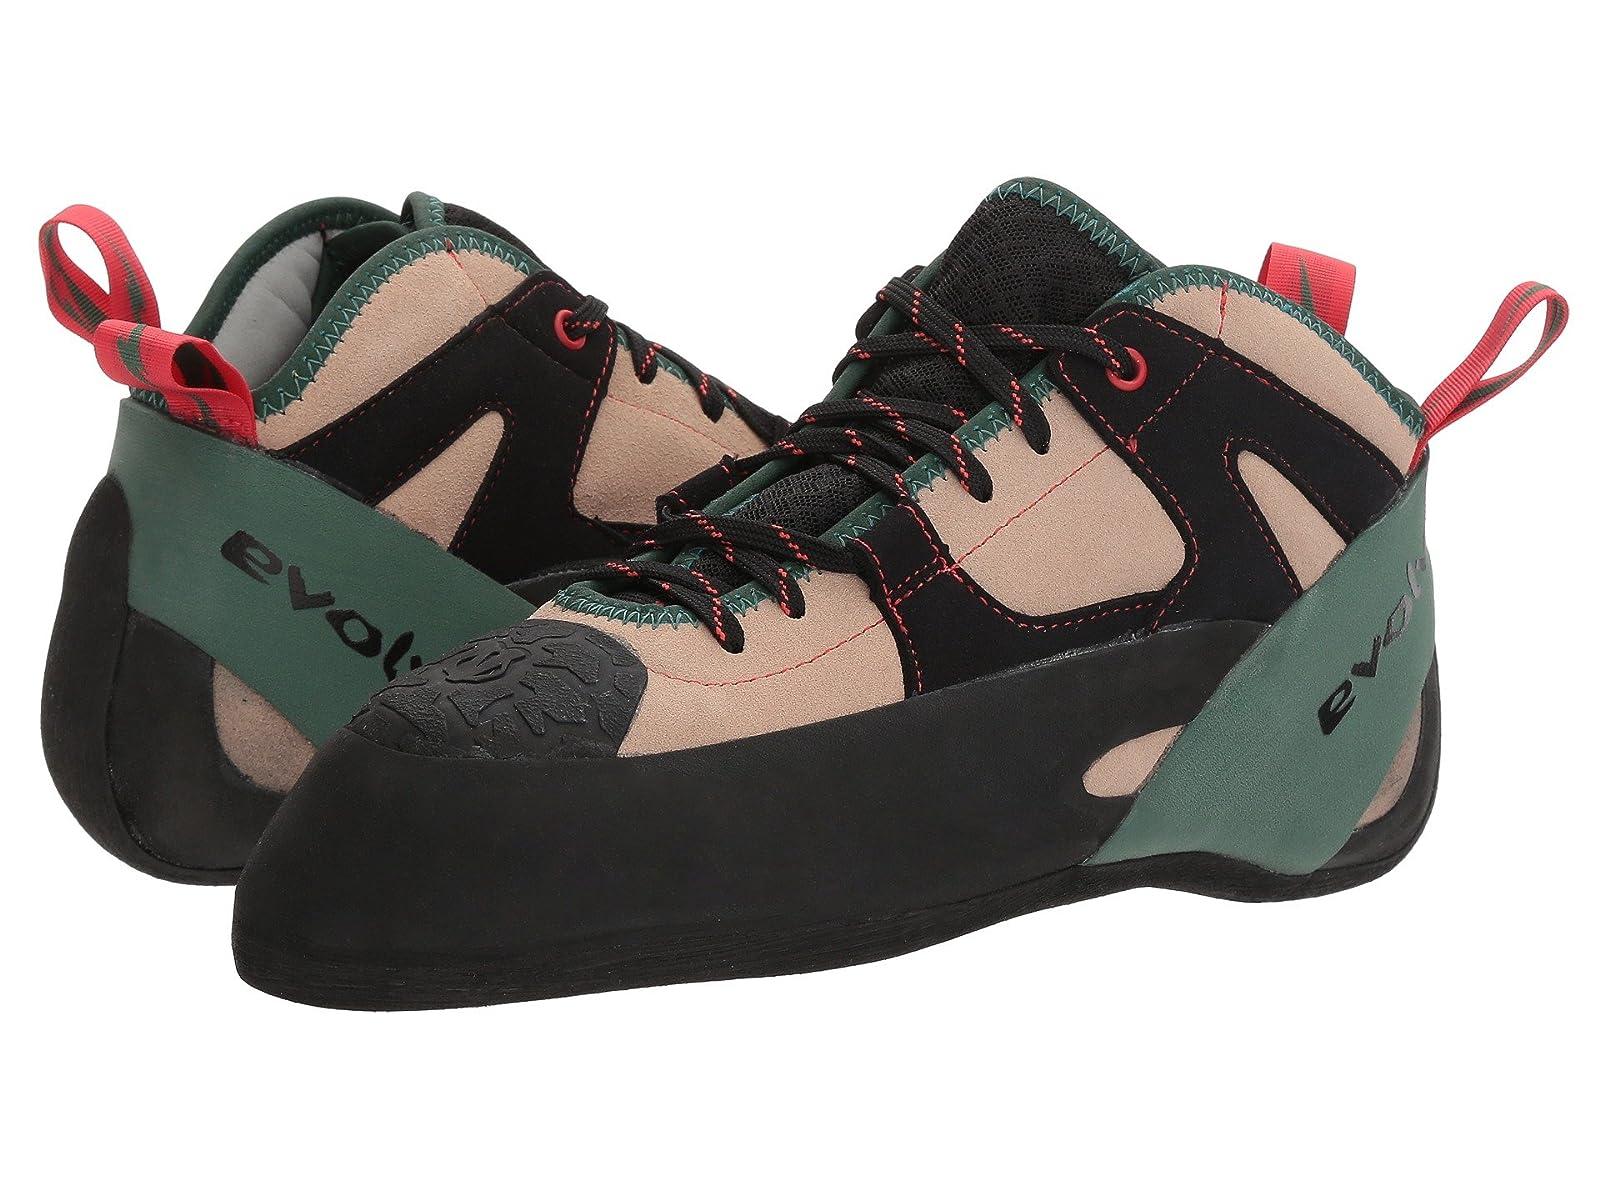 EVOLV The GeneralAtmospheric grades have affordable shoes